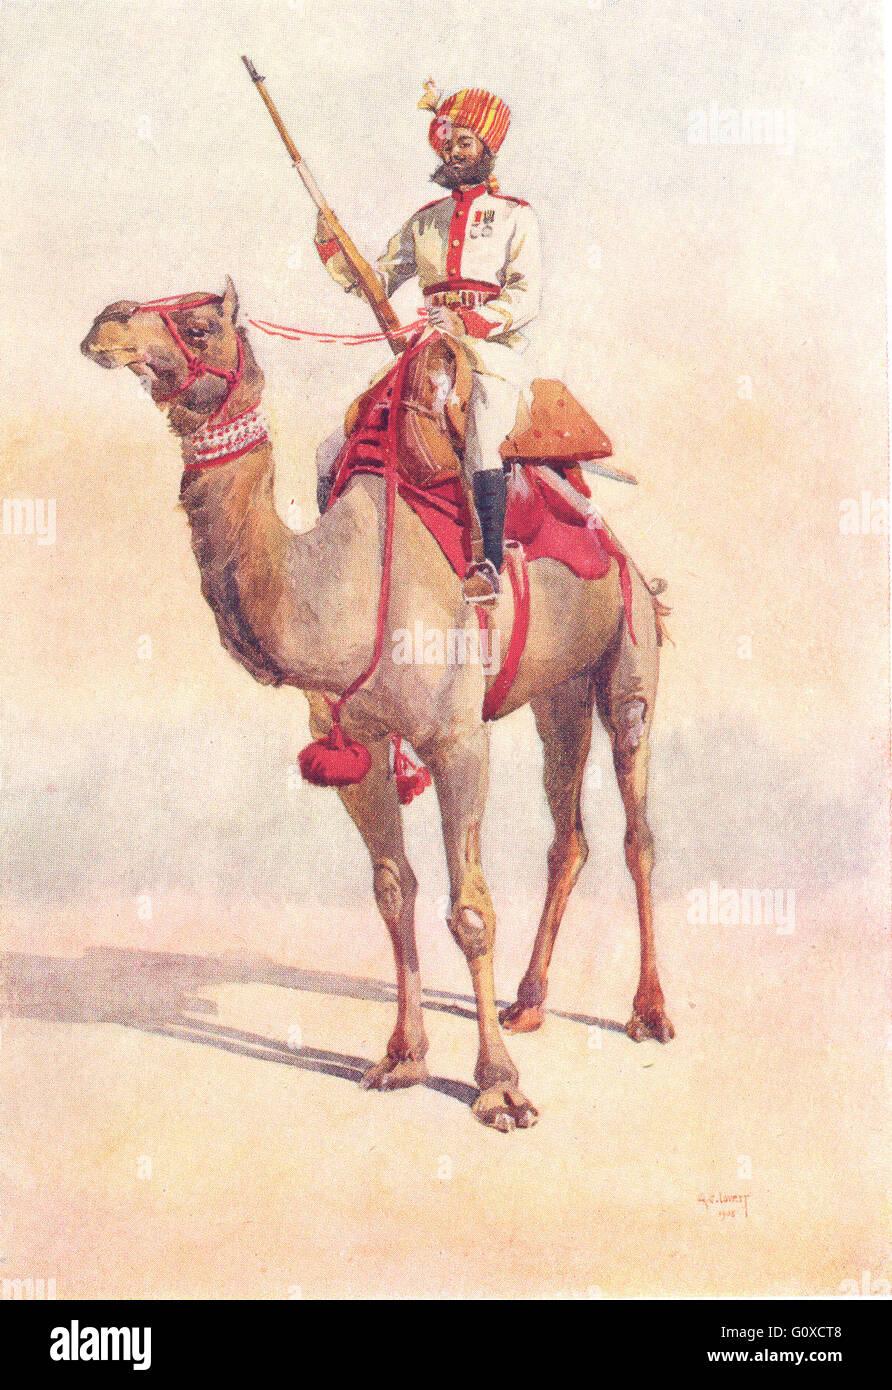 INDIA: Armies of Native States: Bikaner Ganga risala Ratore Rajput, print 1911 - Stock Image